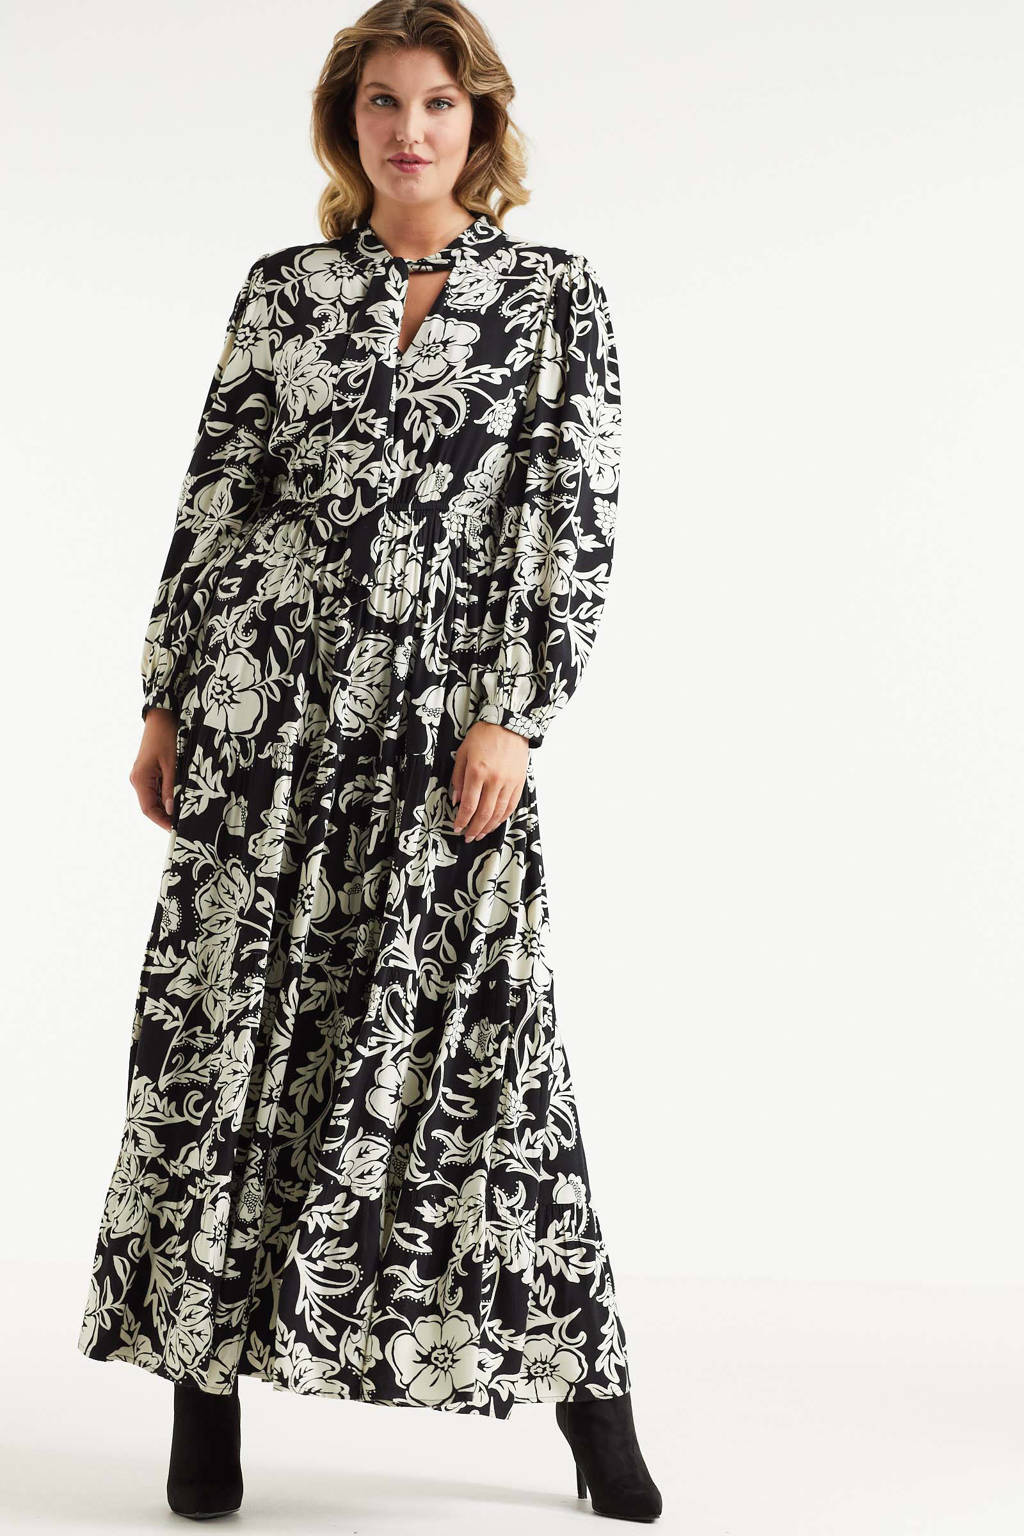 Miljuschka by Wehkamp maxi jurk met bloemenprint zwart/wit, zwart, ecru